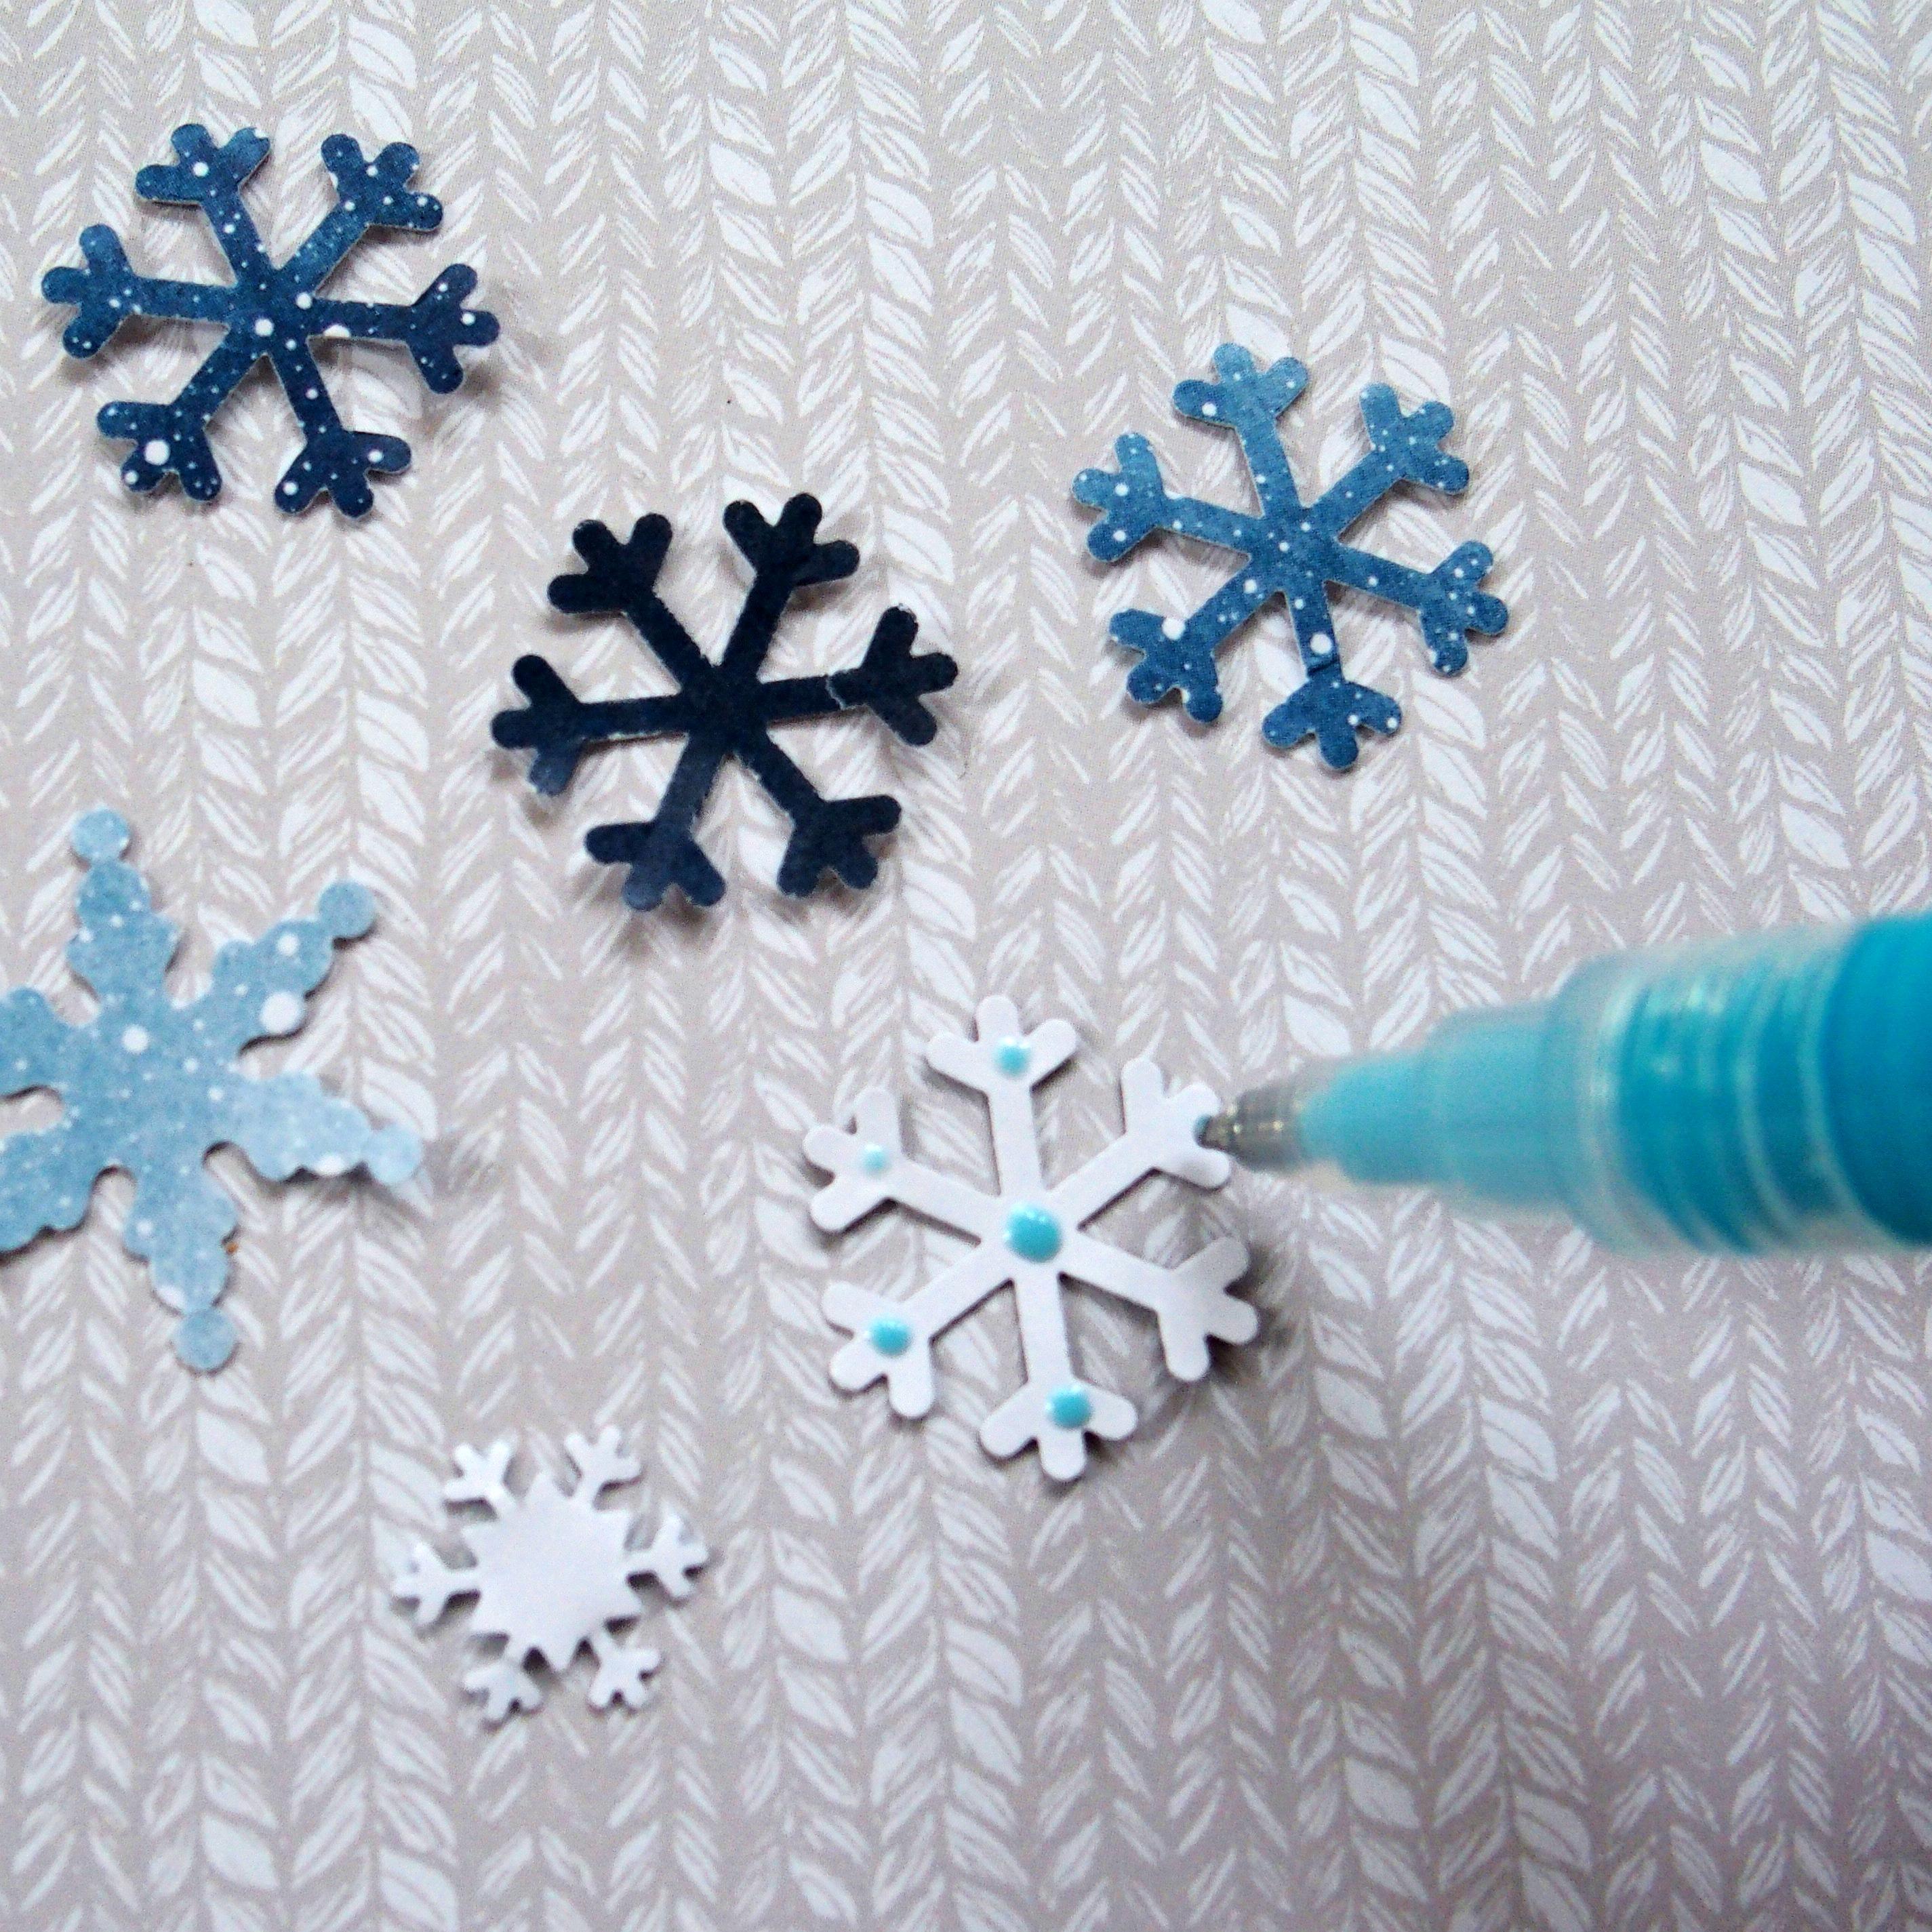 Wintery-Glacier-Wintertime-Wonder-Border-Snowflakes-Creative-Memories